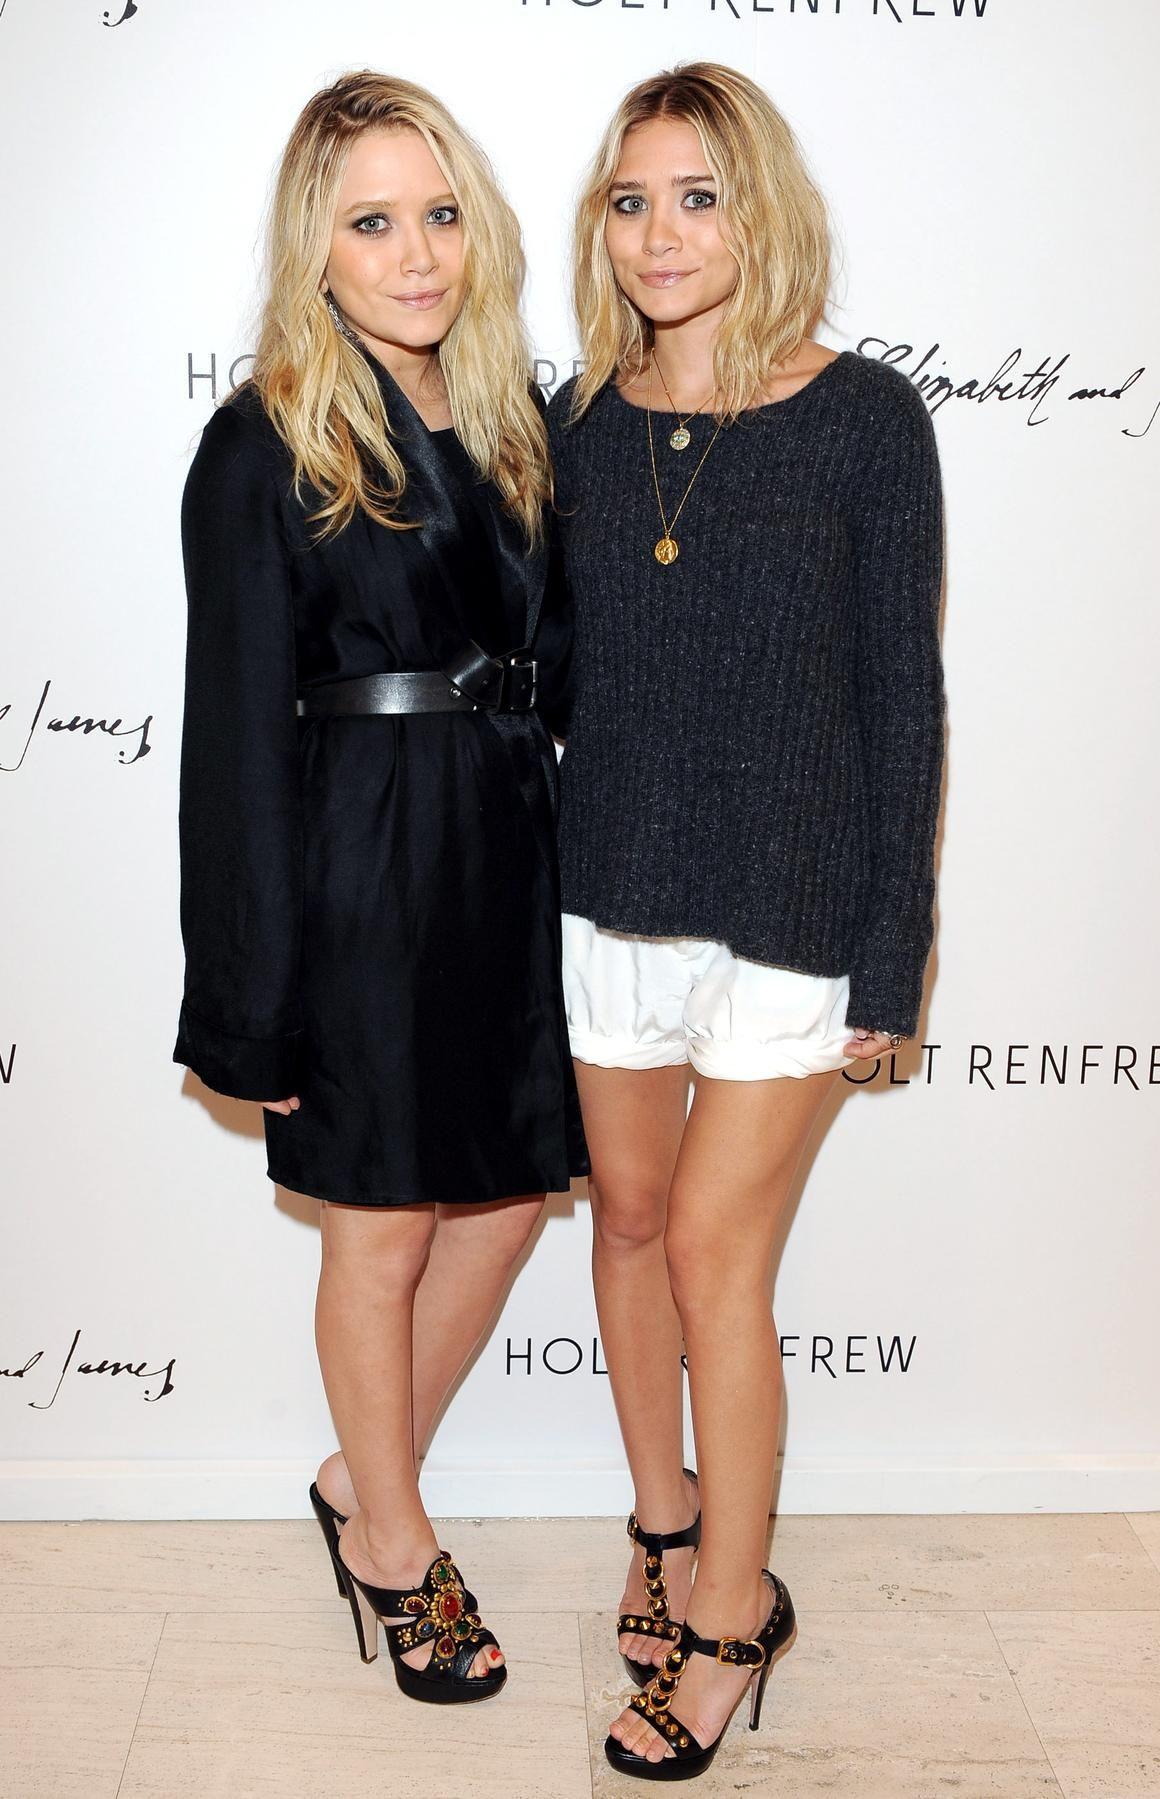 The Mary Kate Olsen Look Book Olsen Twins Style Olsen Fashion Ashley Olsen Style